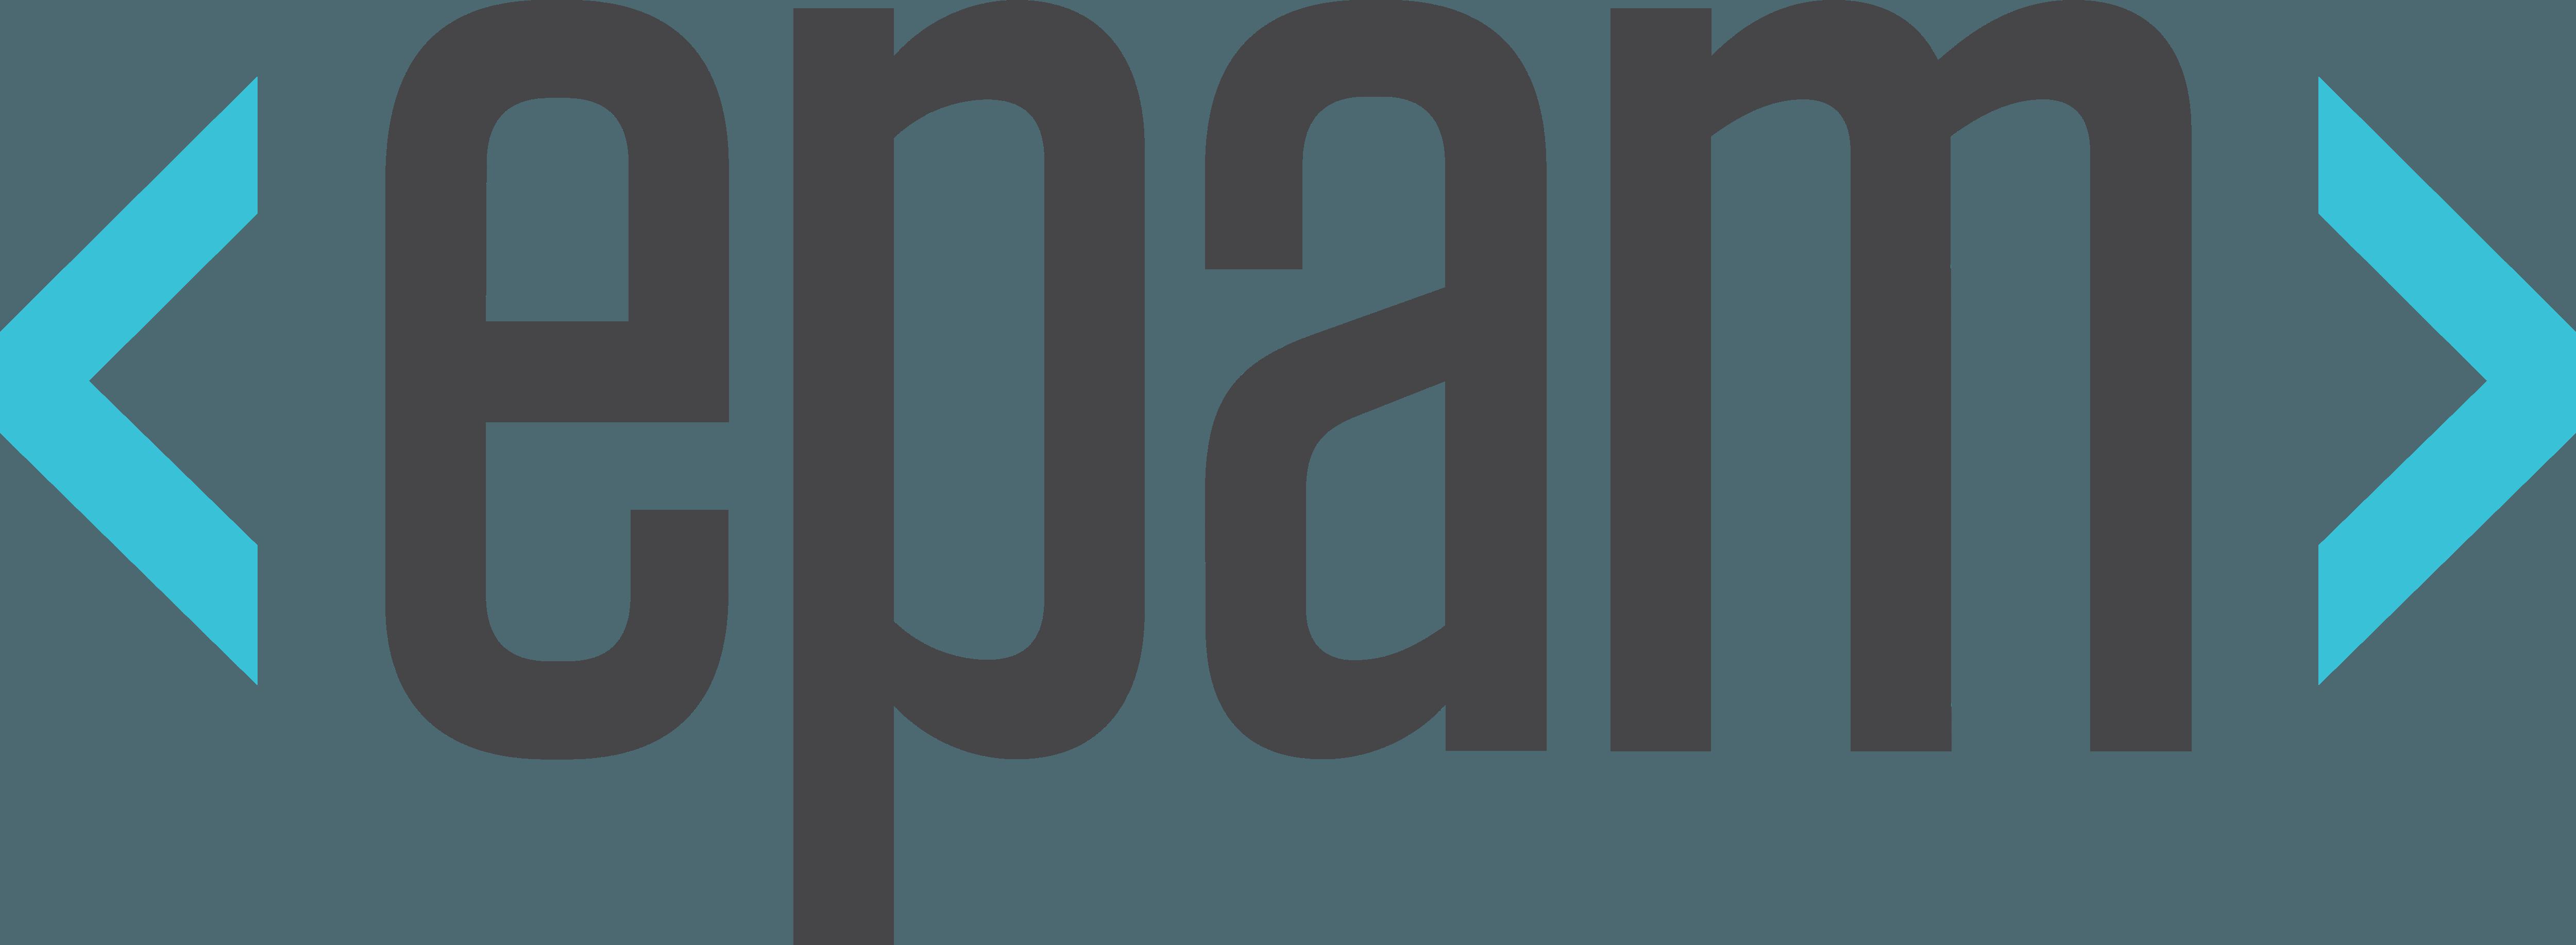 Epam_Systems_Logo